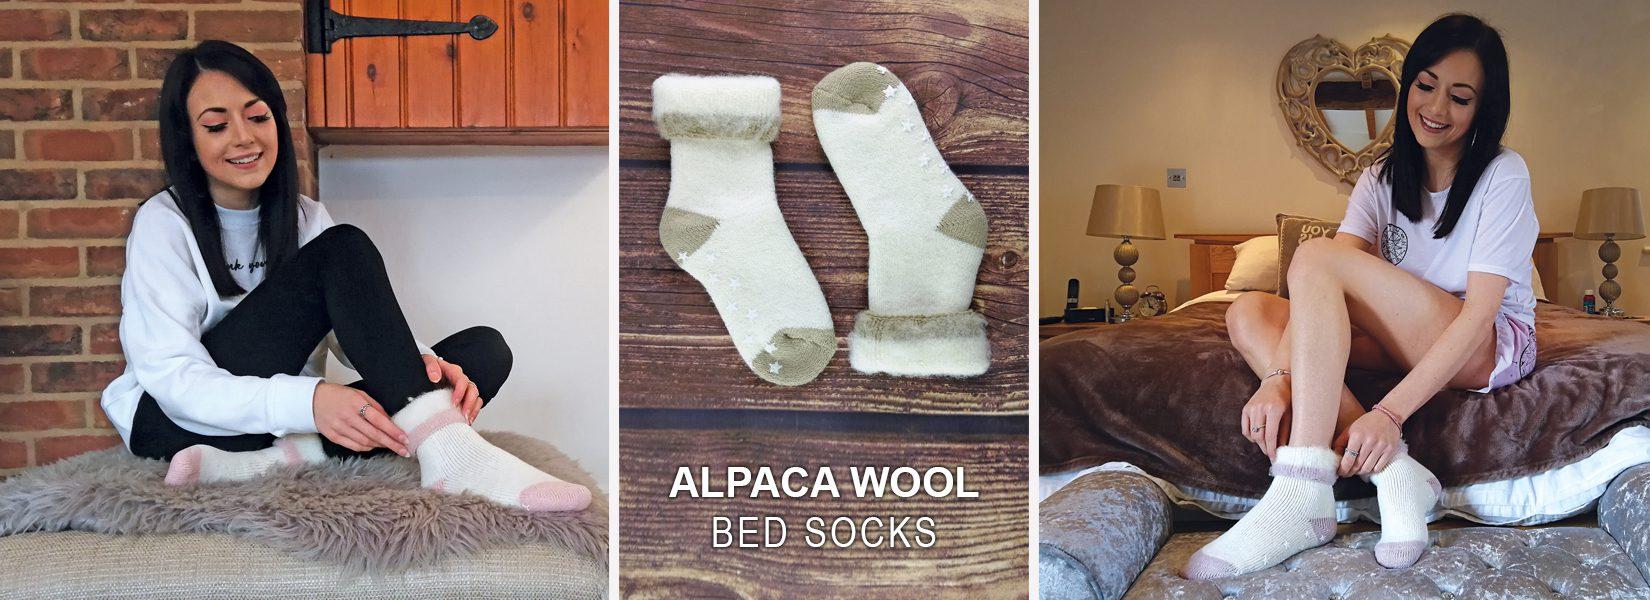 alpaca wool bed socks - warm indoor slipper socks for winter